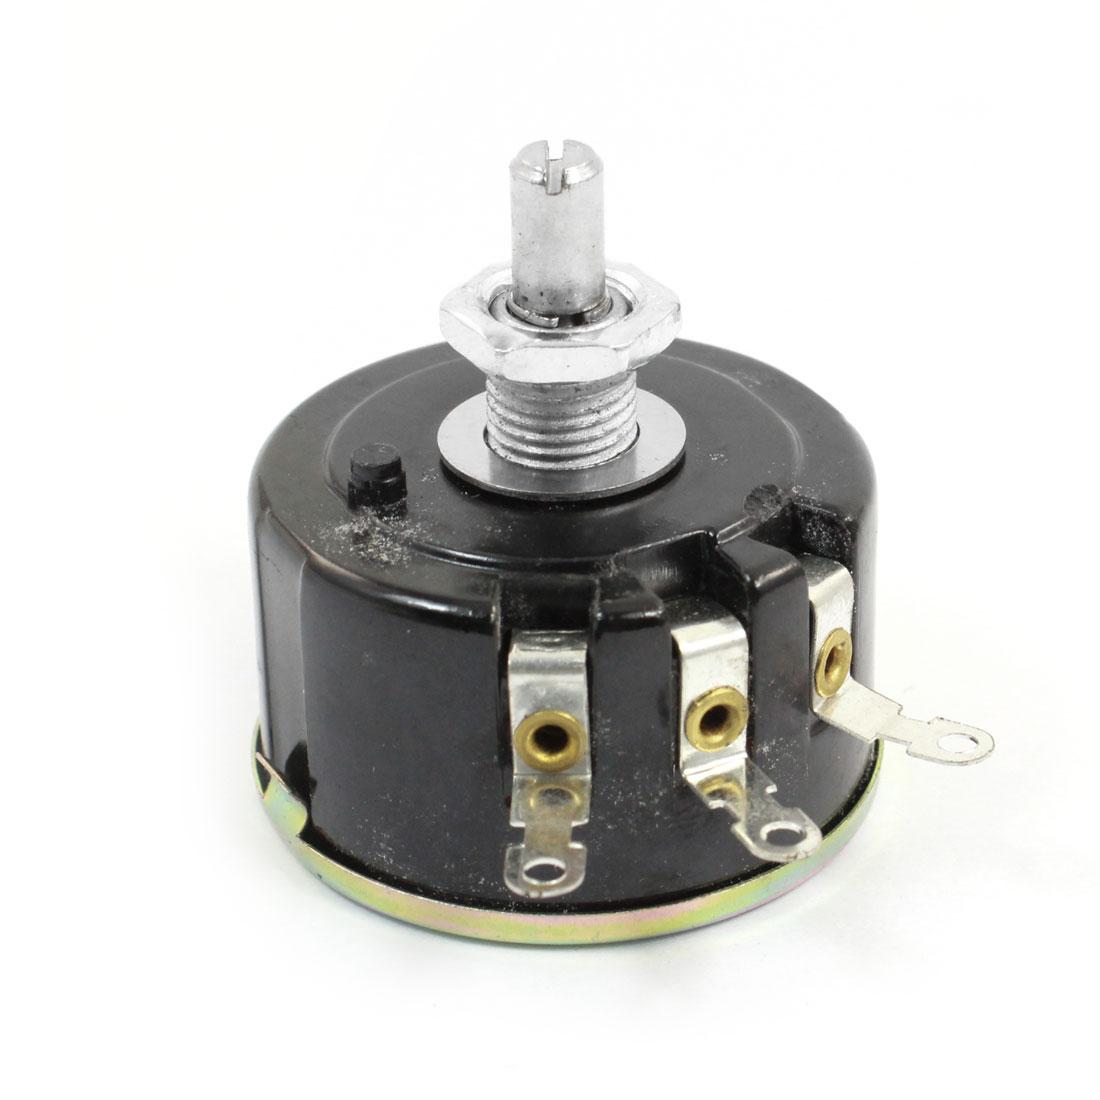 Full Size 1K Ohm 5W 5Watt Wire Wound Potentiometer Pot 42mm Body Diameter